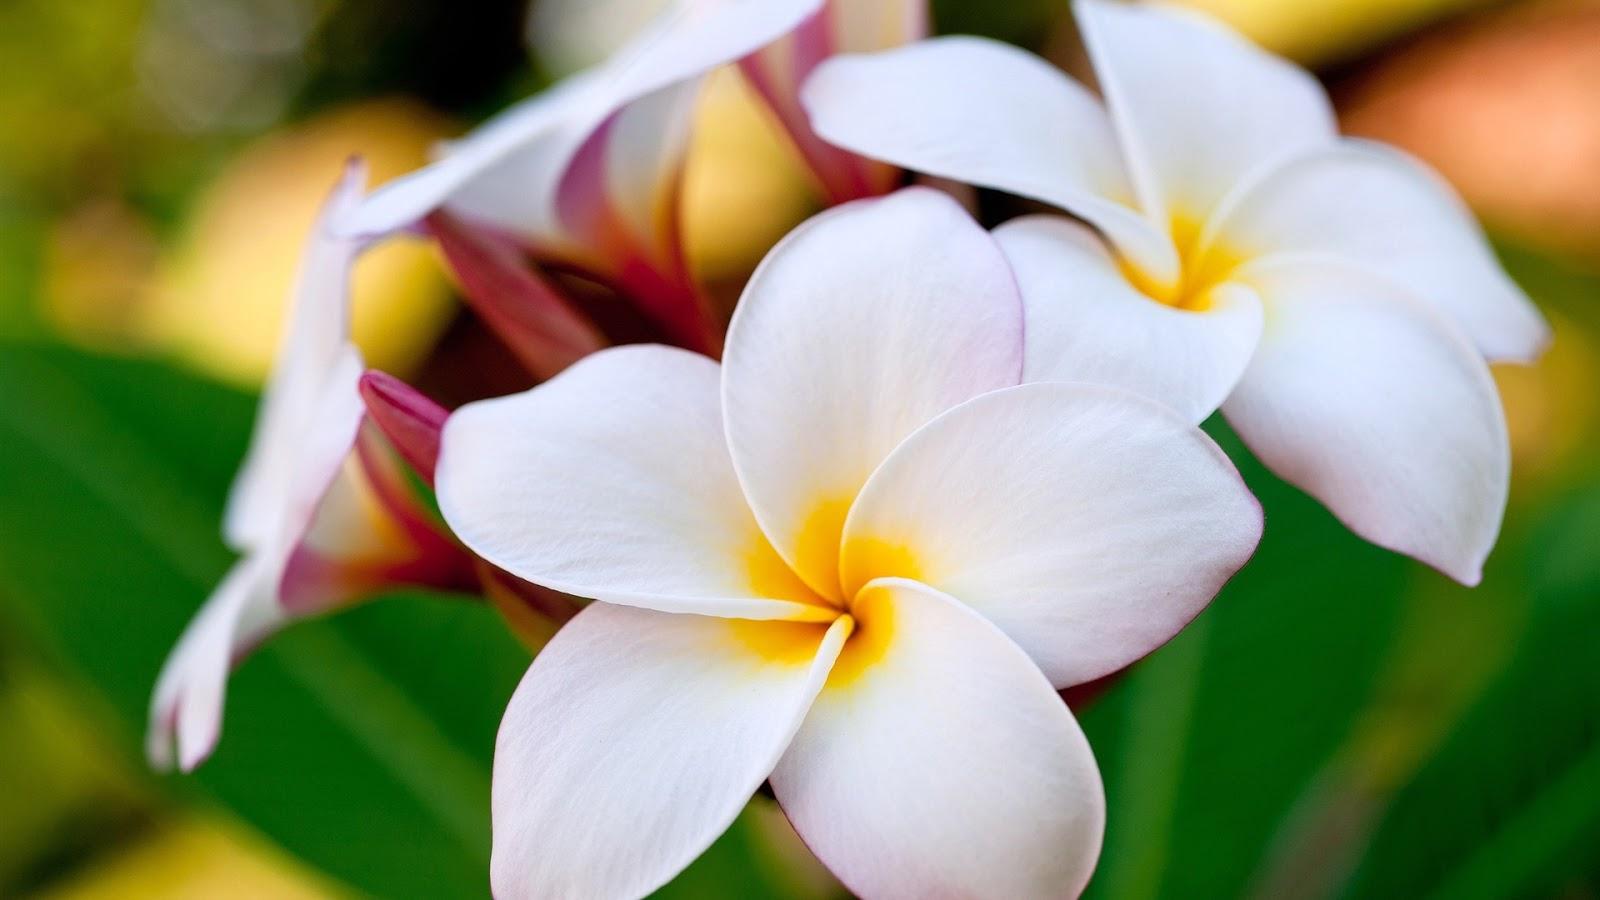 بالصور صور اجمل الورود , اجمل الورود واحلاها 3662 9